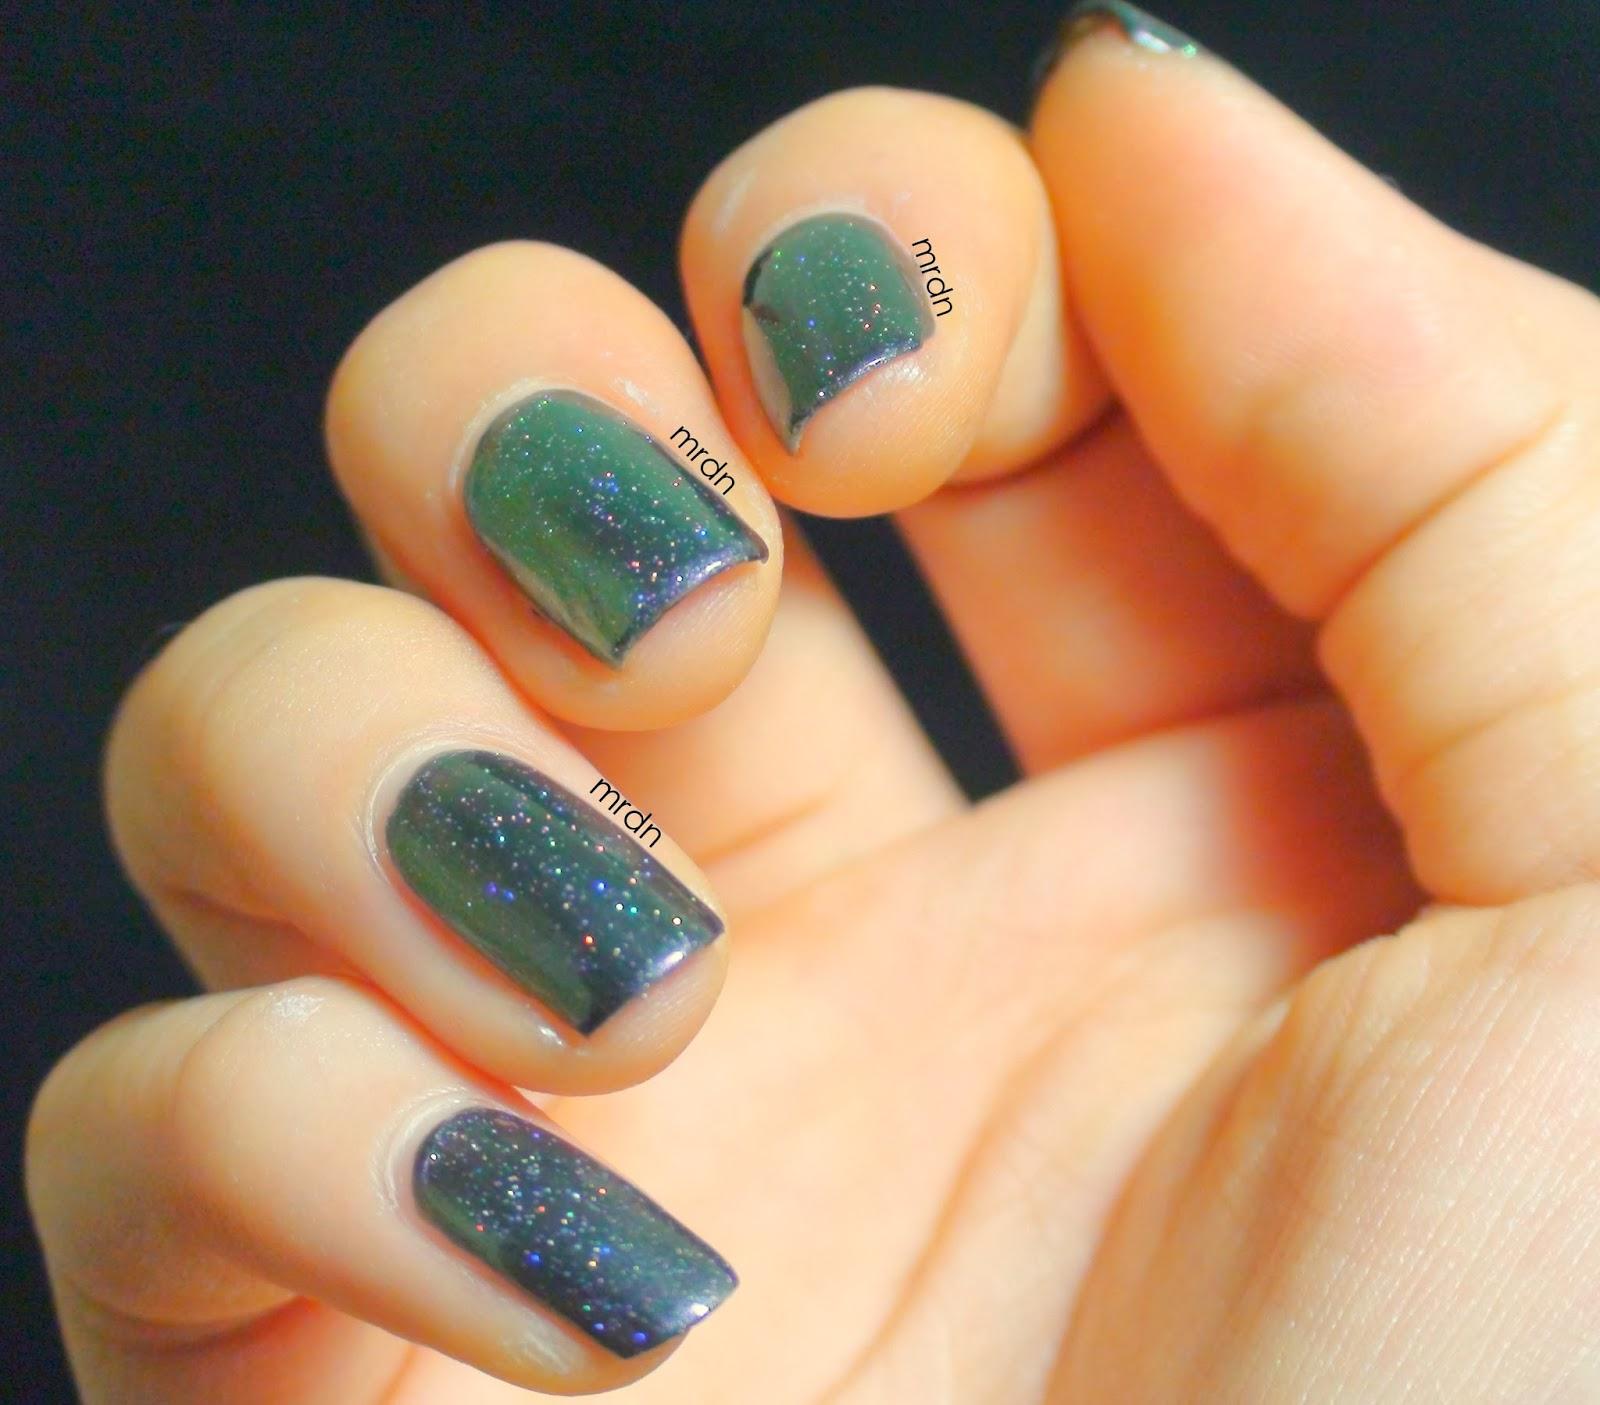 Nail Art London: My Rainy Day Nails: Color Block Nail Art With Butter London